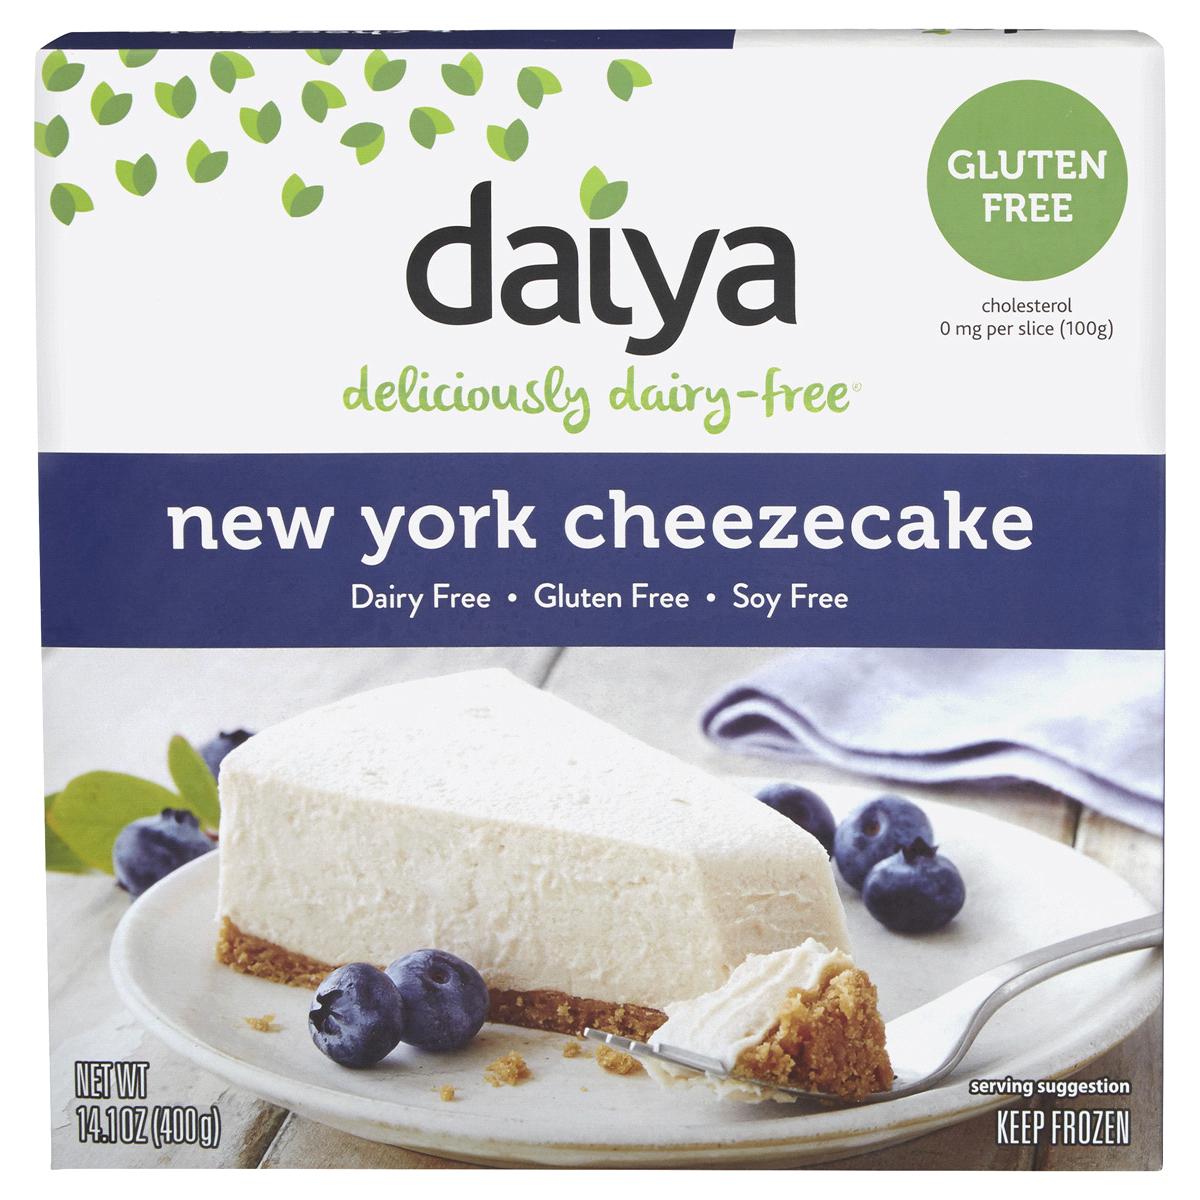 Daiya Cheezecake